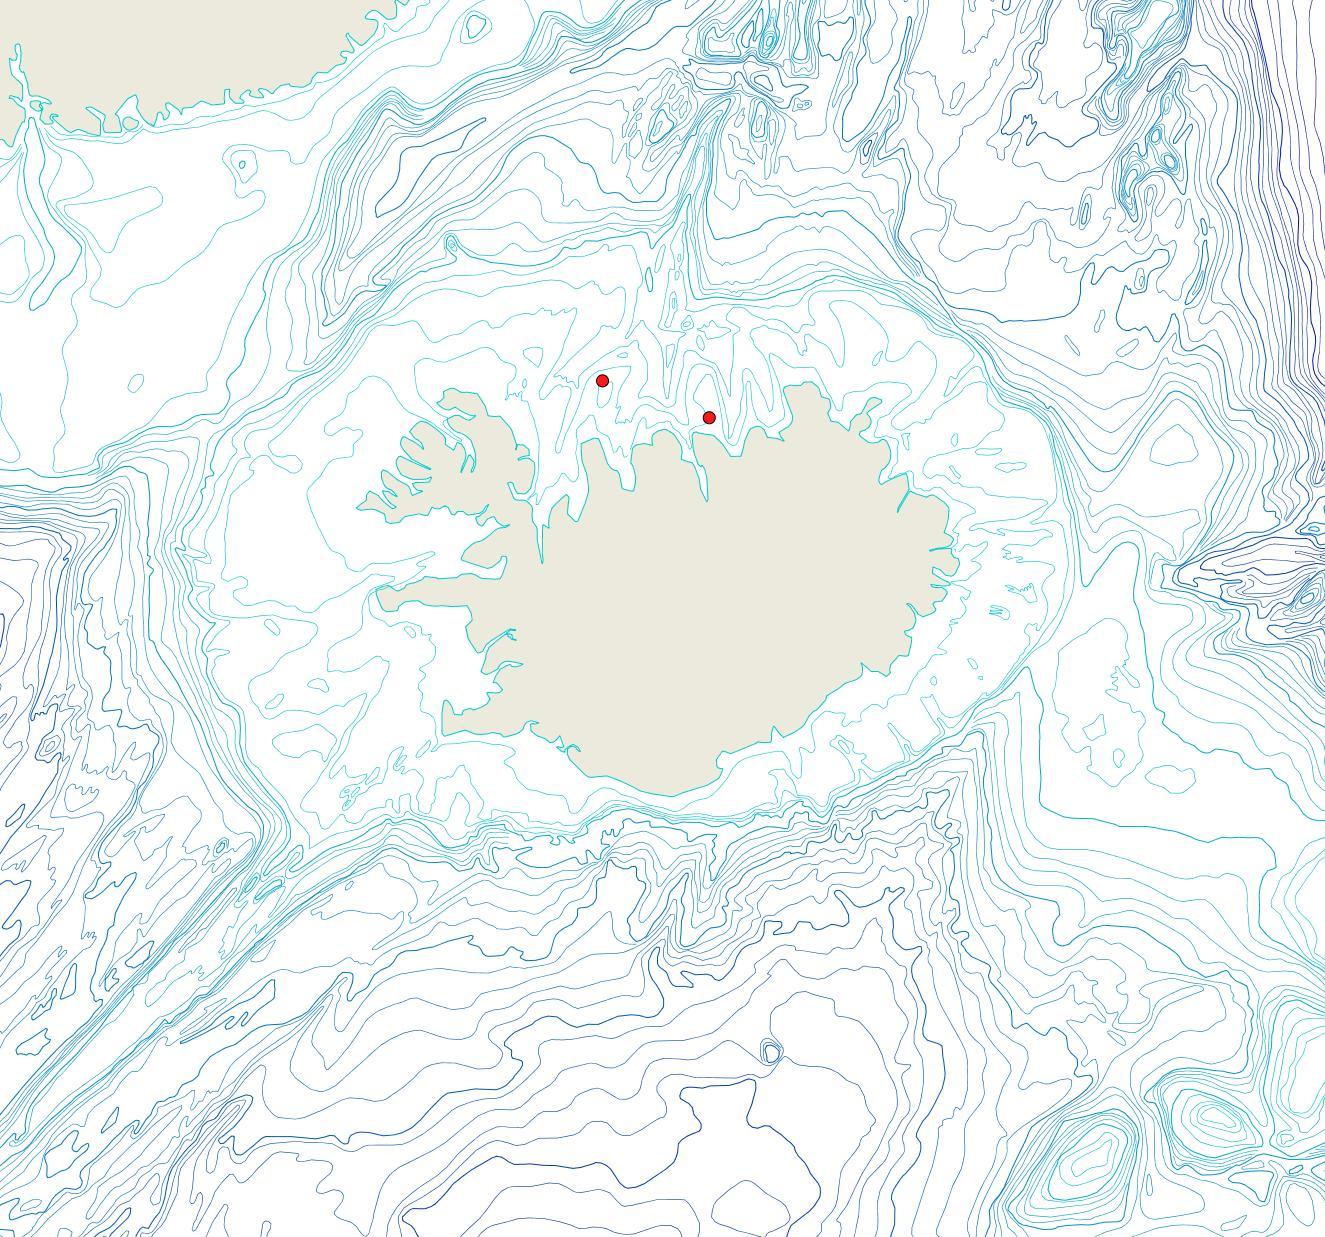 Útbreiðsla Lepraliella contigua(Bioice samples, red dots)